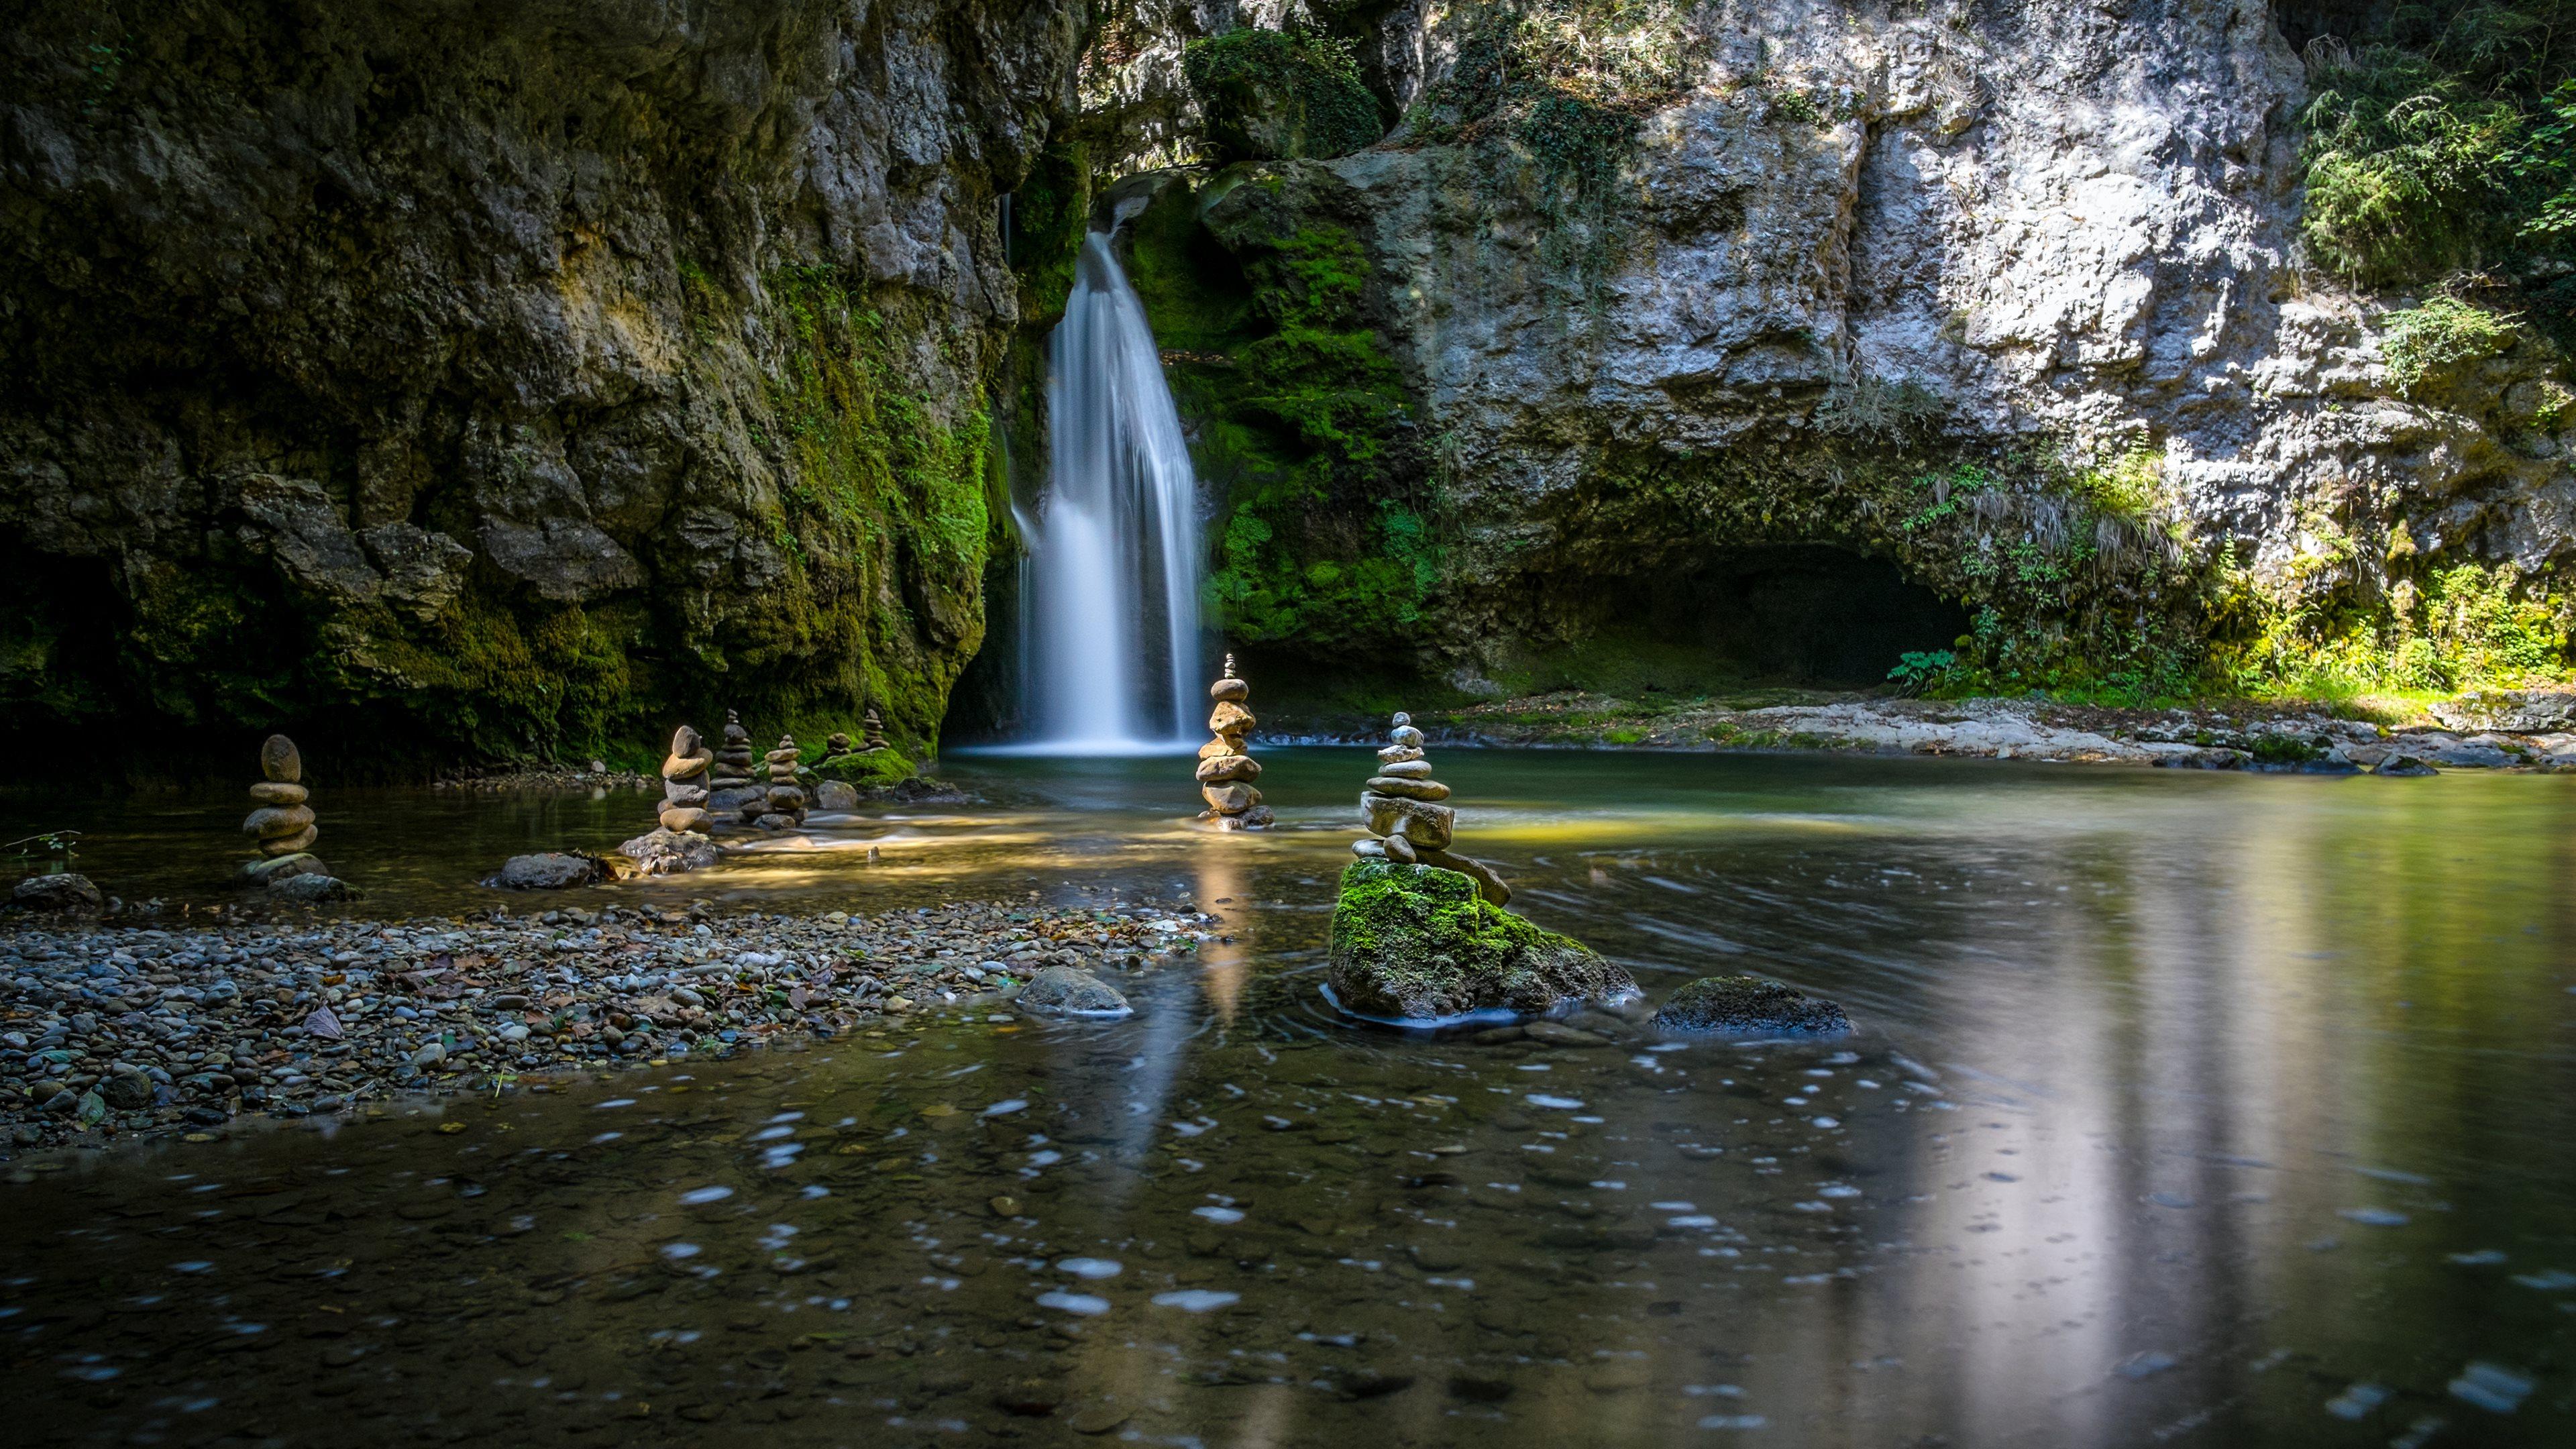 Great Wallpaper: Zen Garden Waterfalls. Ultra HD 4K 3840x2160